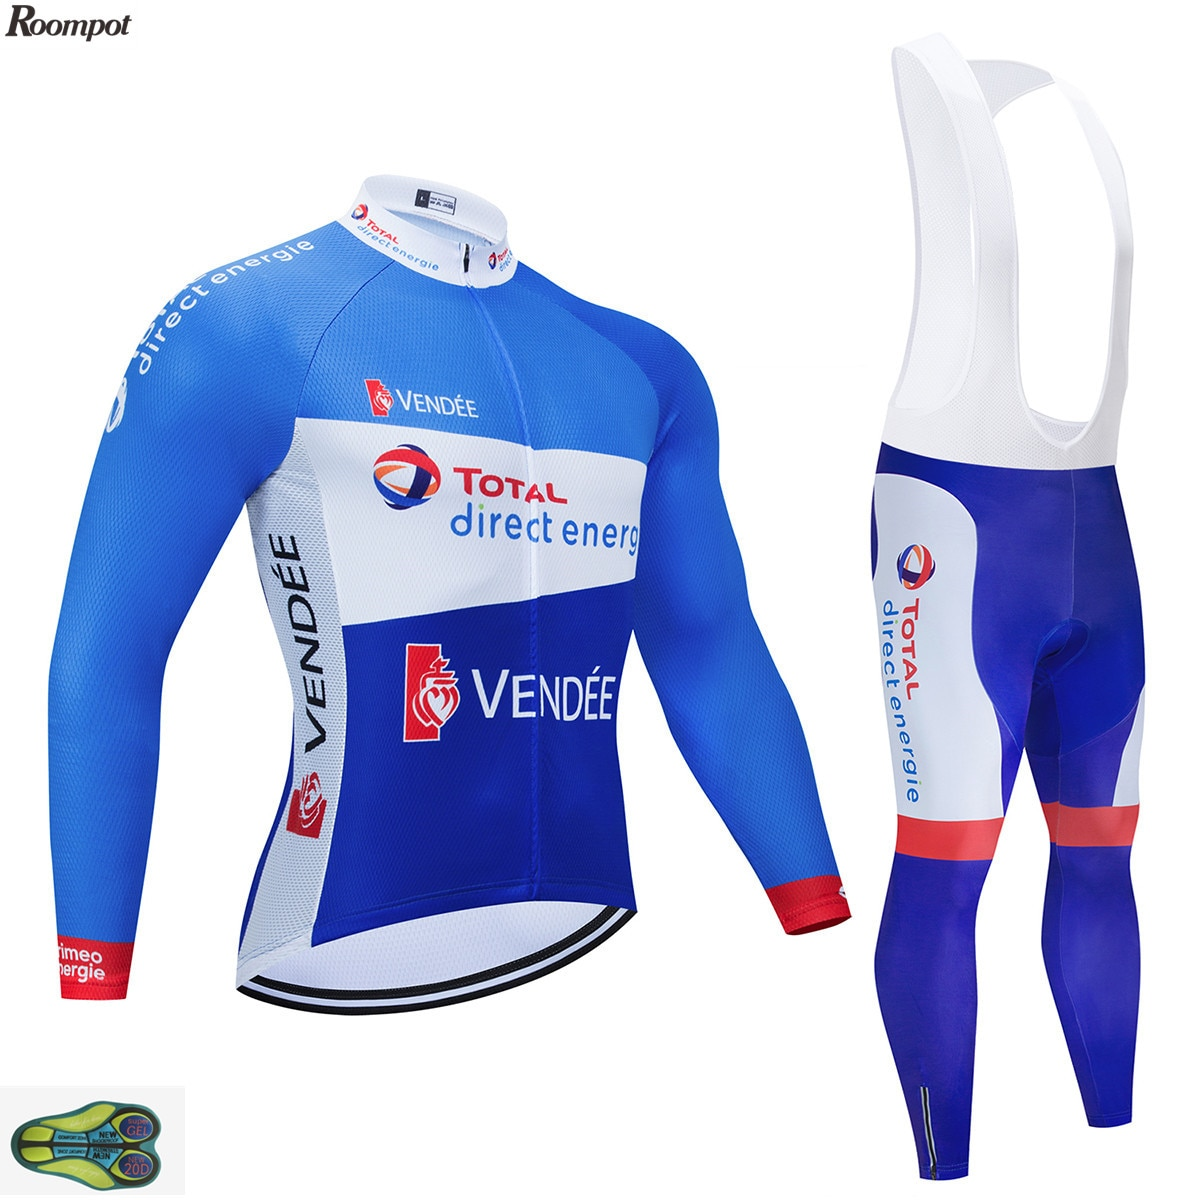 2020 Conjunto de Jersey de Ciclismo de manga larga, conjunto de Ciclismo, Ropa de Ciclismo profesional bicicleta Invierno 20D